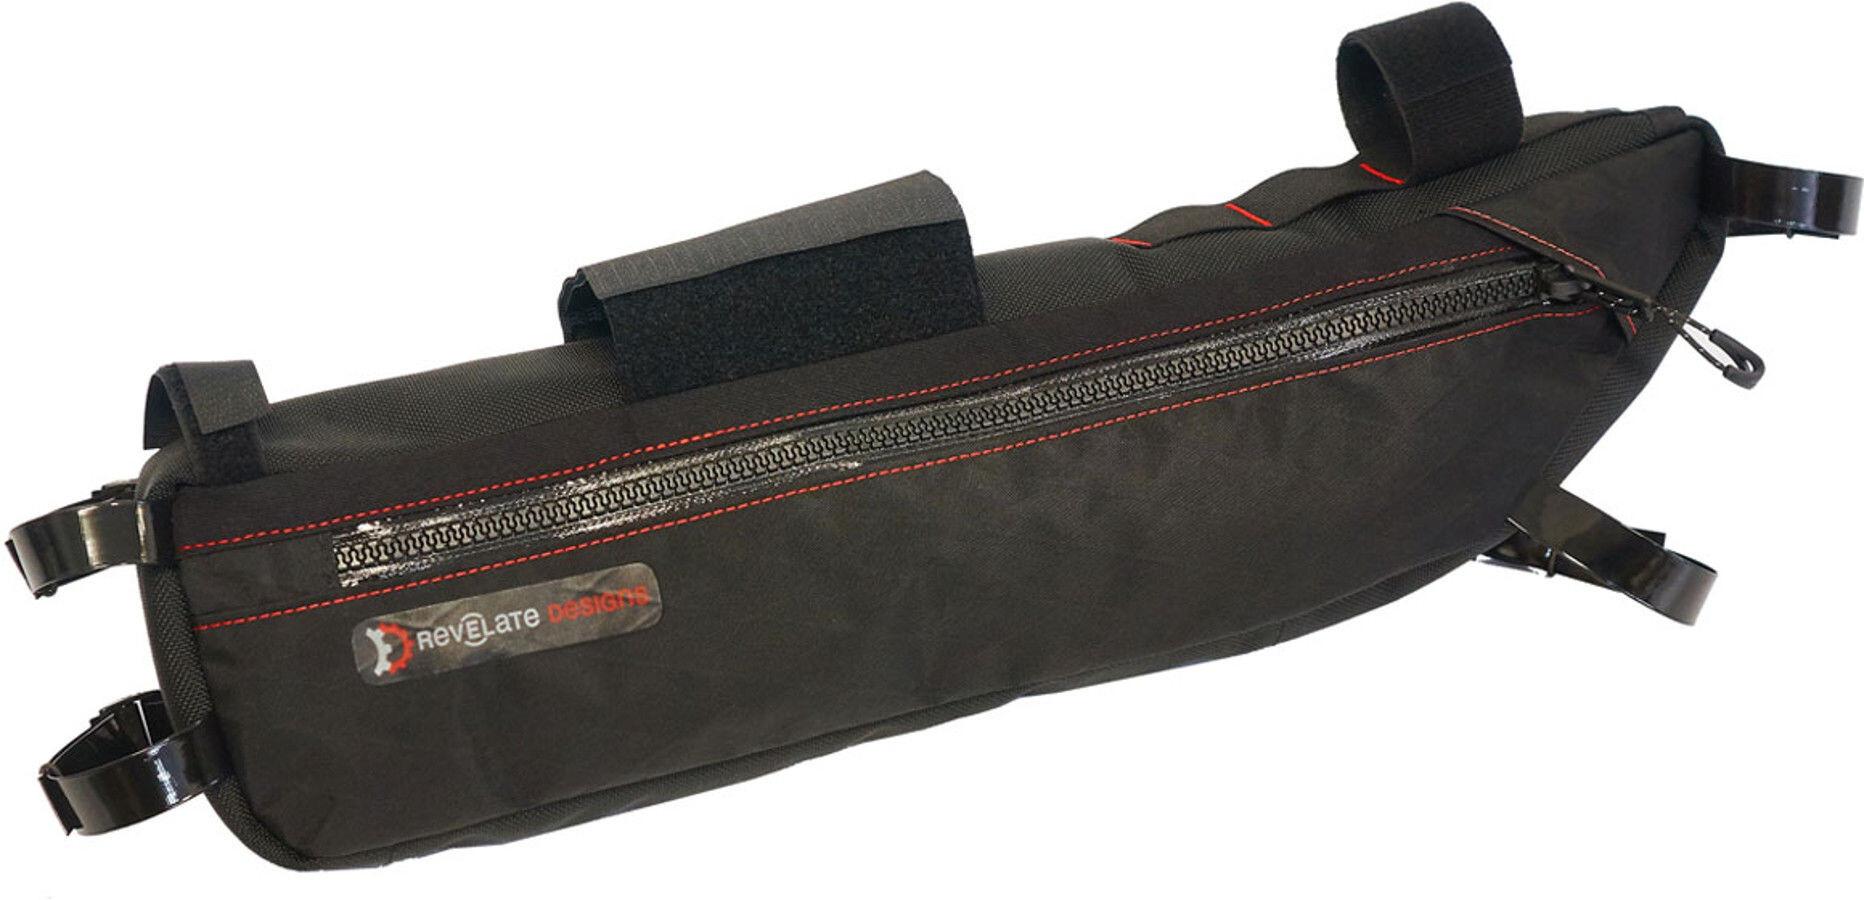 Revelate Designs Tangle Cykeltaske S, black | Frame bags